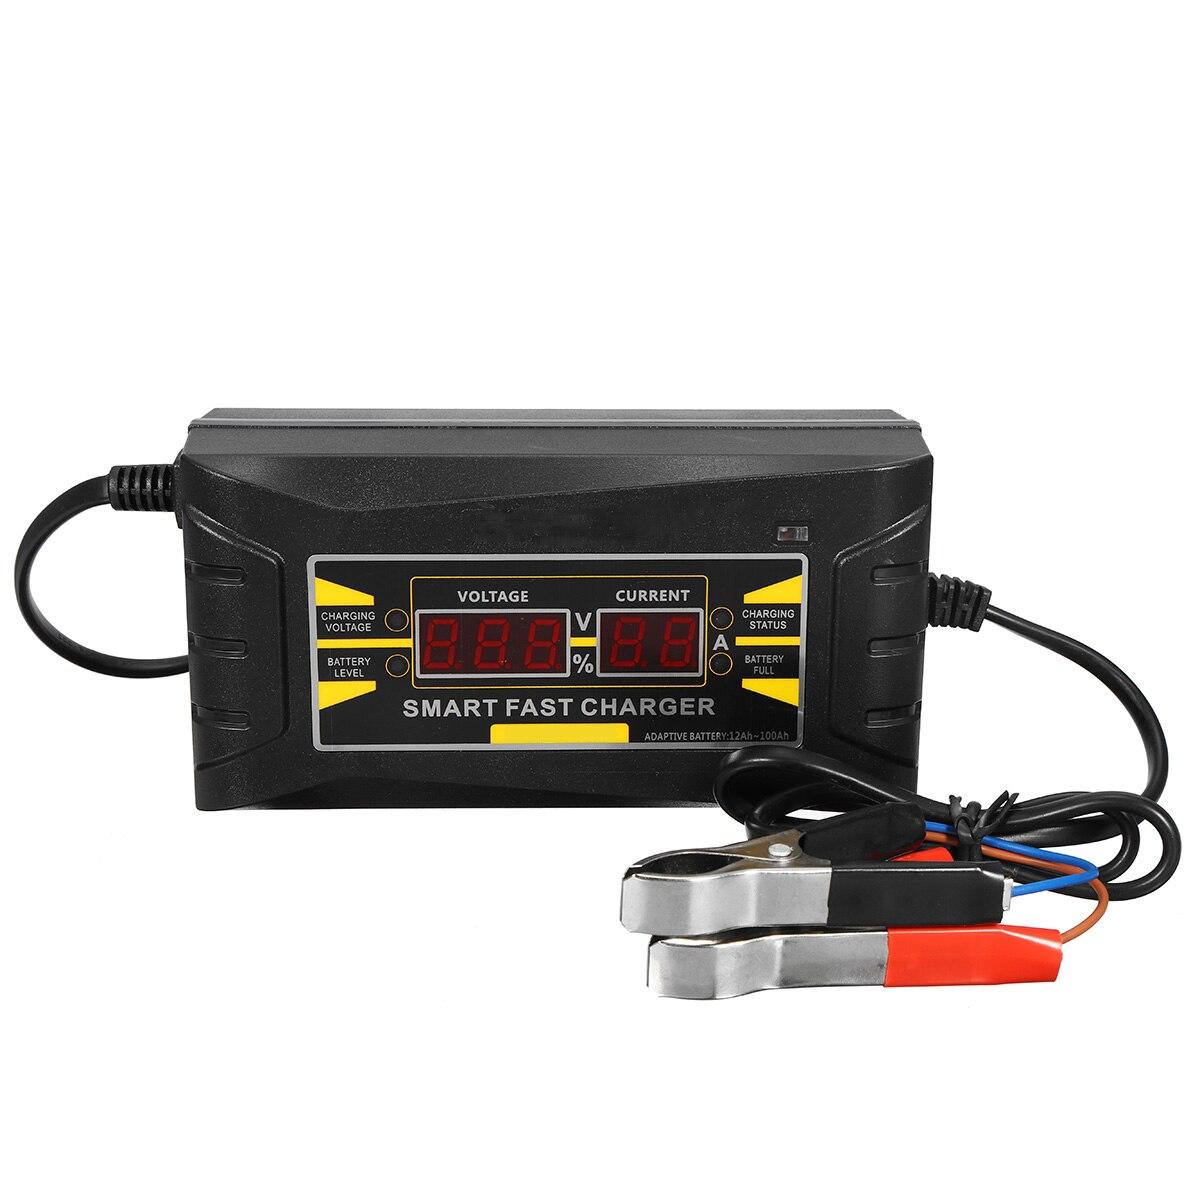 Full Automatic Car font b Battery b font Charger Smart Fast 110V 220V To 12V 6A